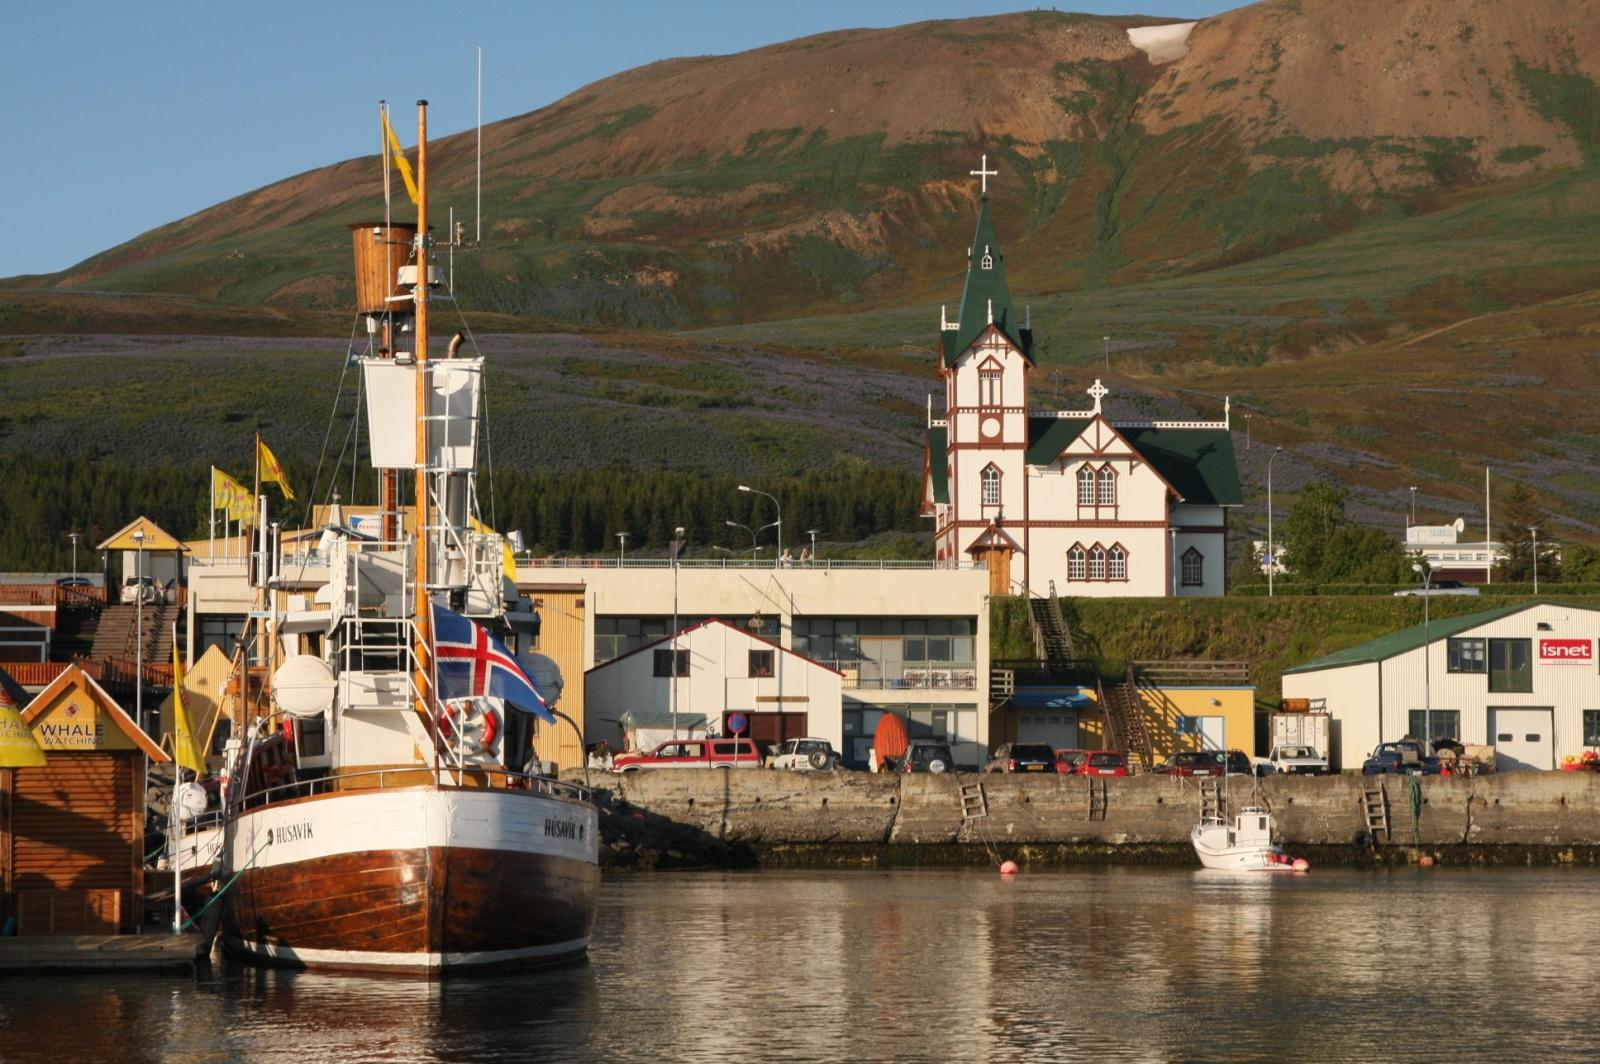 Husavik - the whale-watching capital